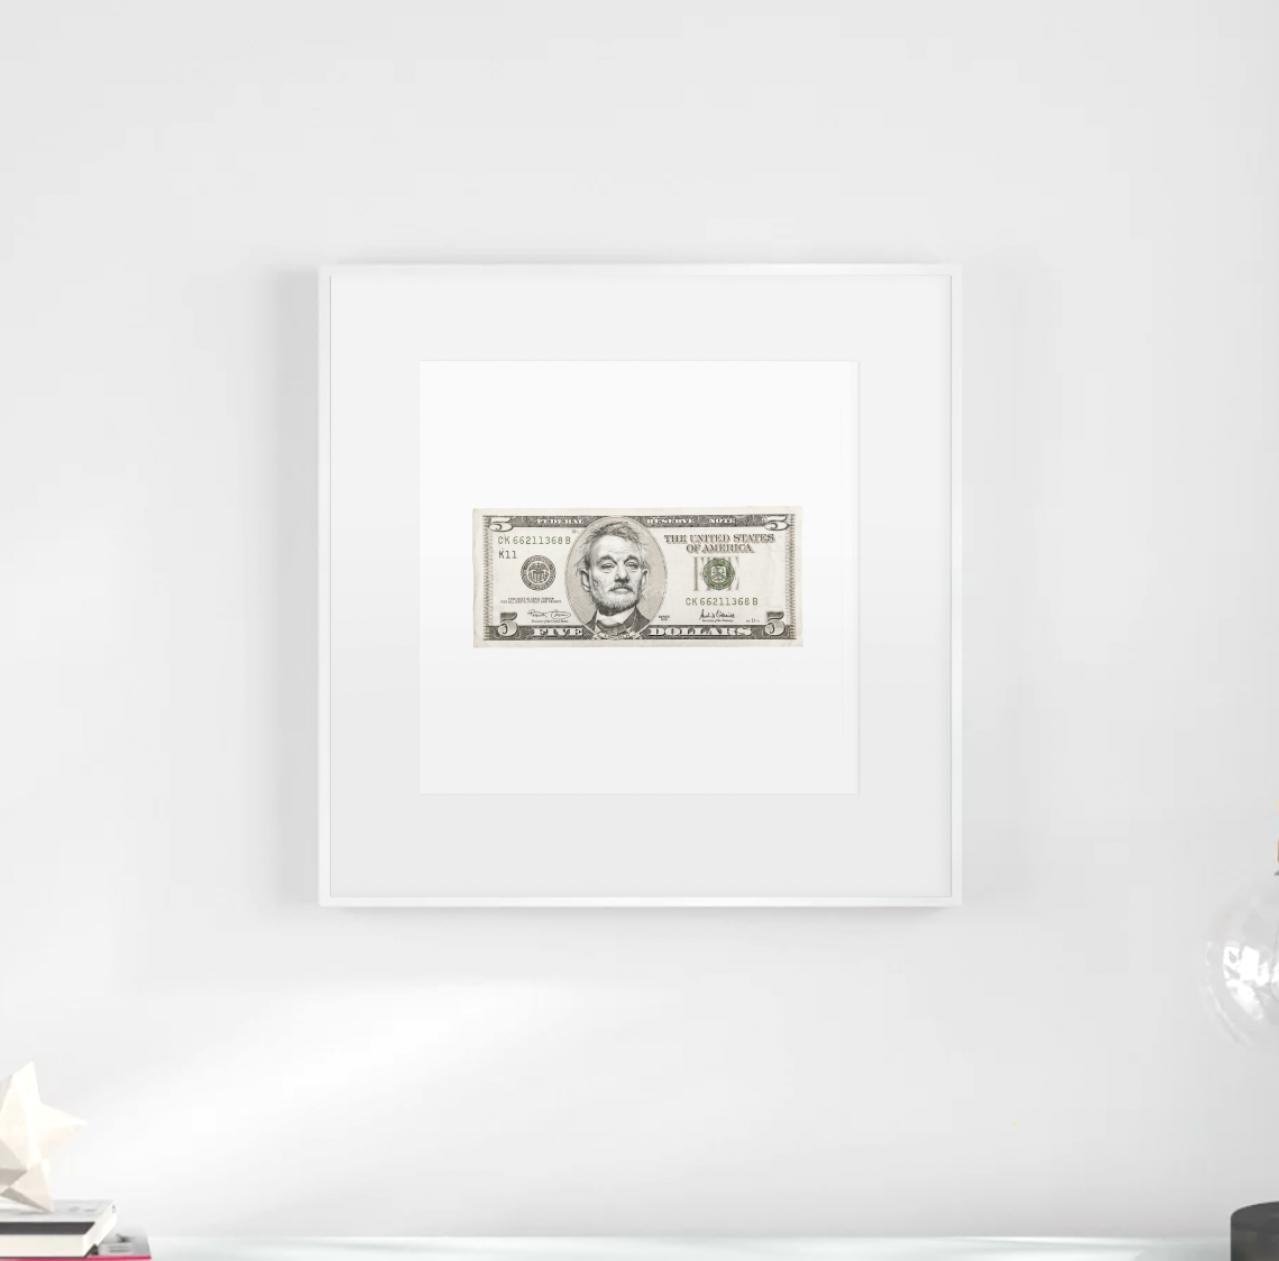 5 dollar bill murray 2 rv8mzu